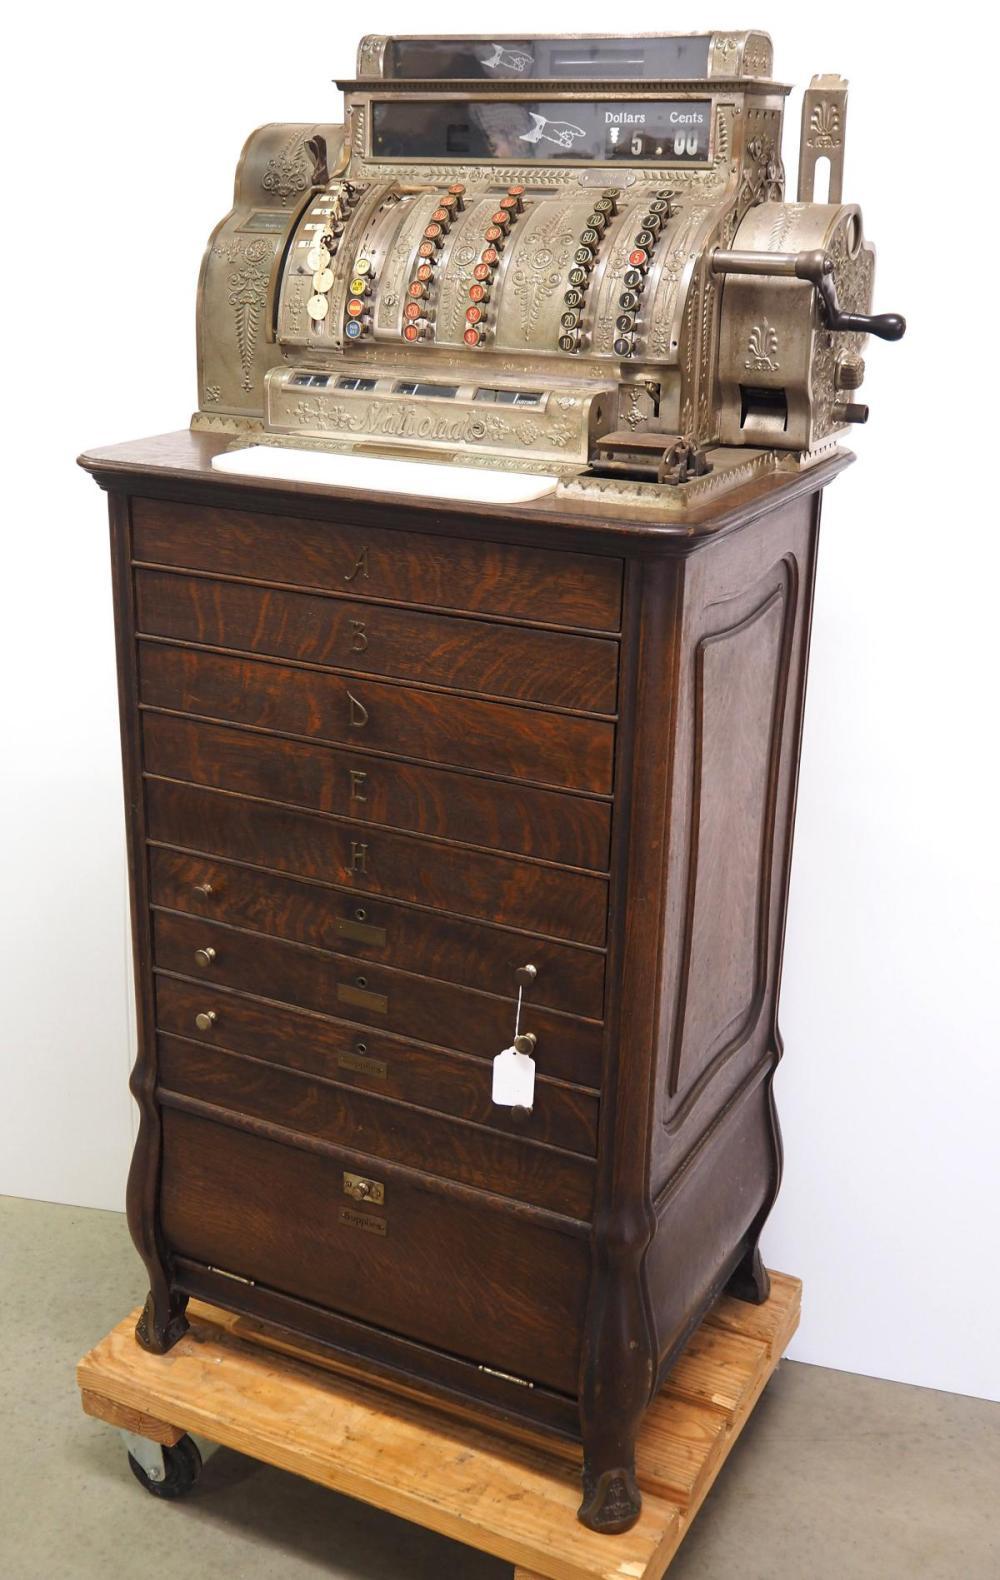 National cash register with cabinet